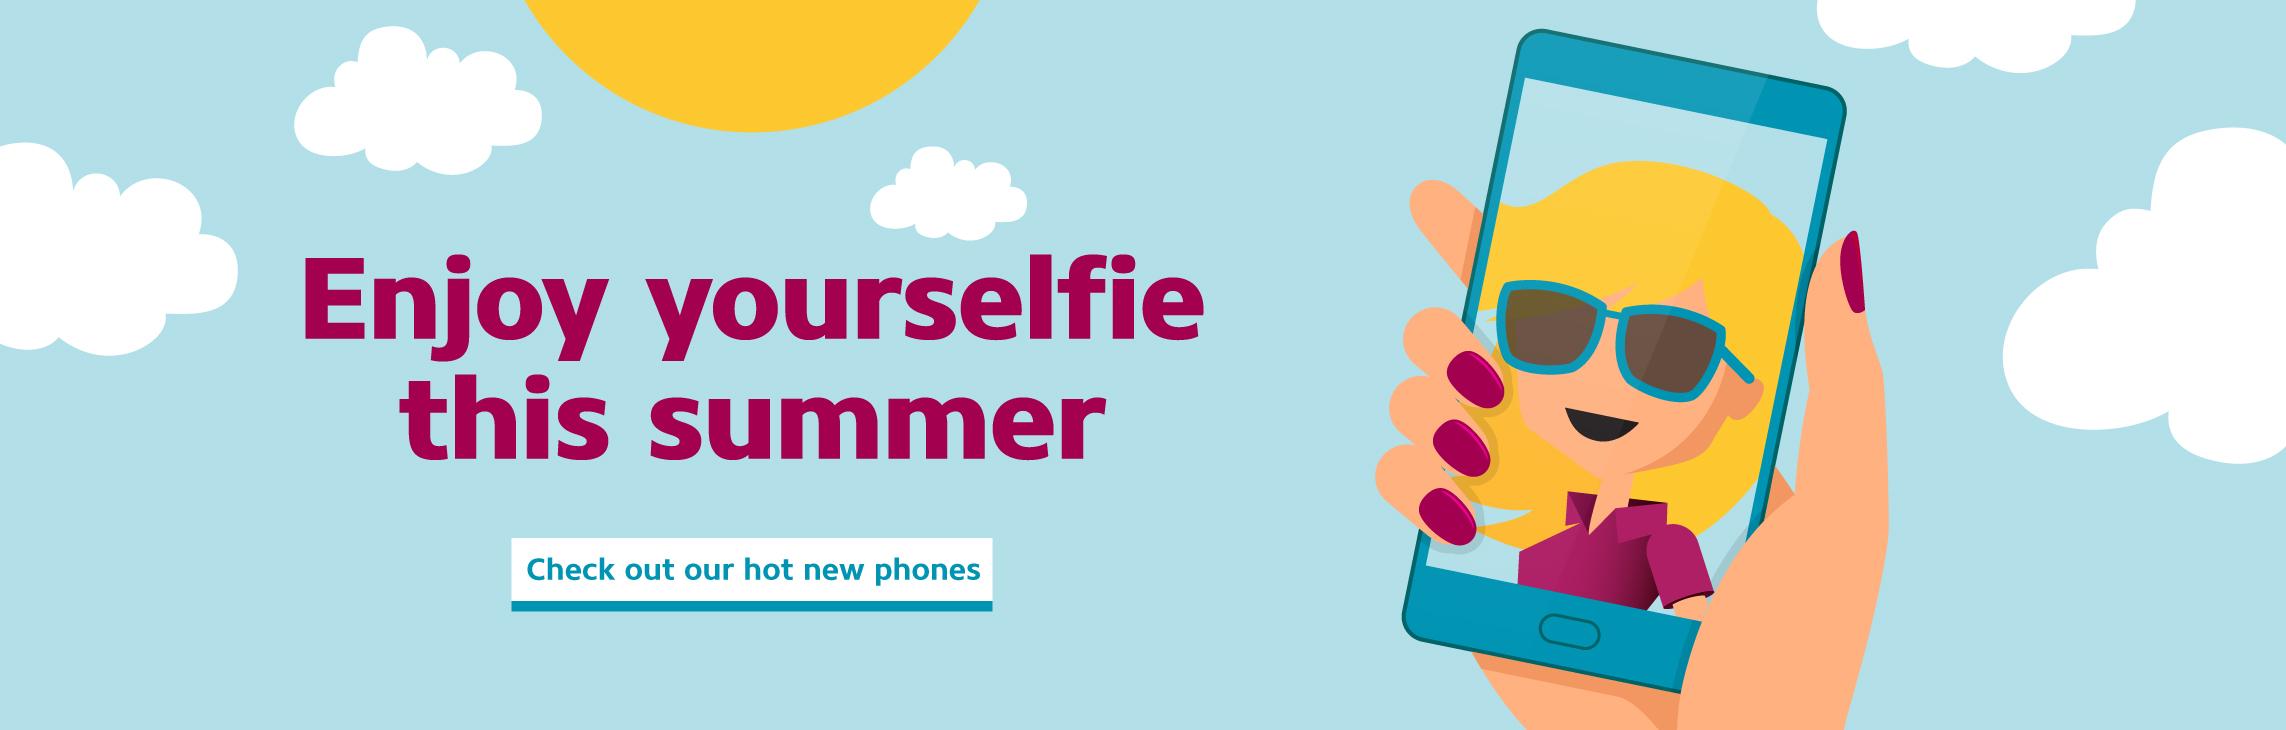 Enjoy yourselfie this summer